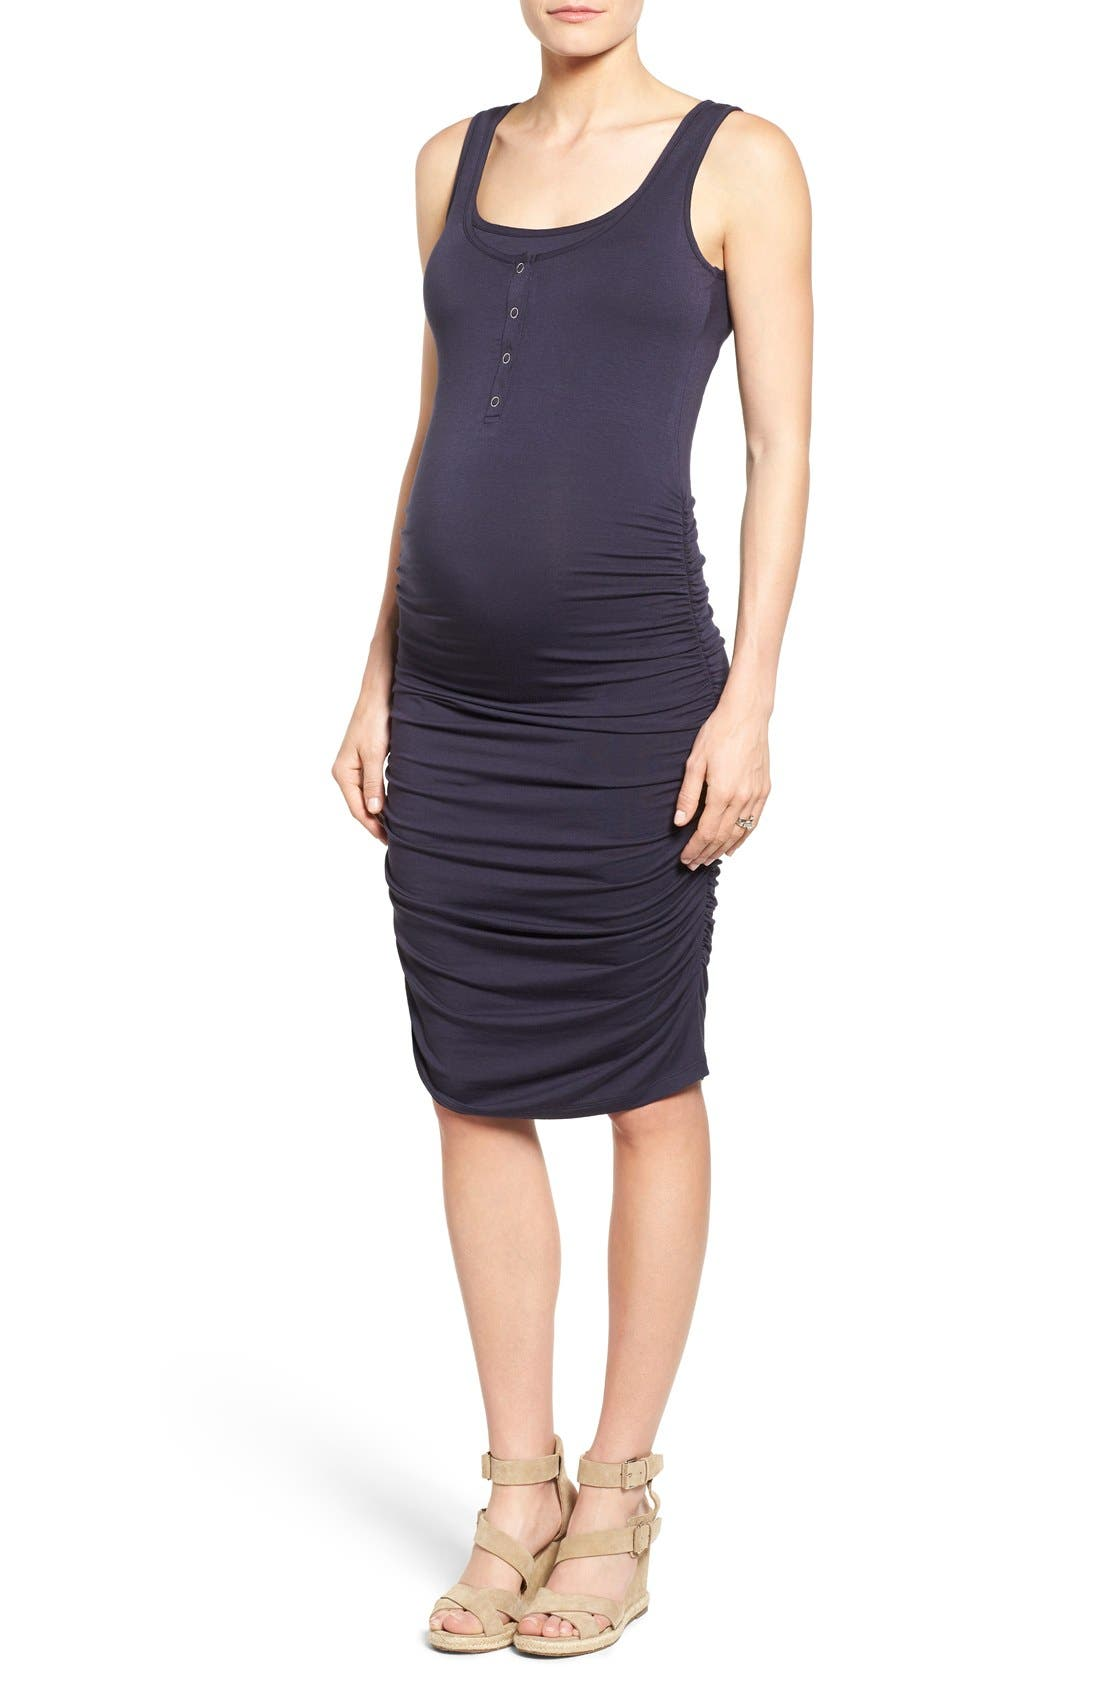 Main Image - Nom Maternity Sleeveless Maternity/Nursing Dress